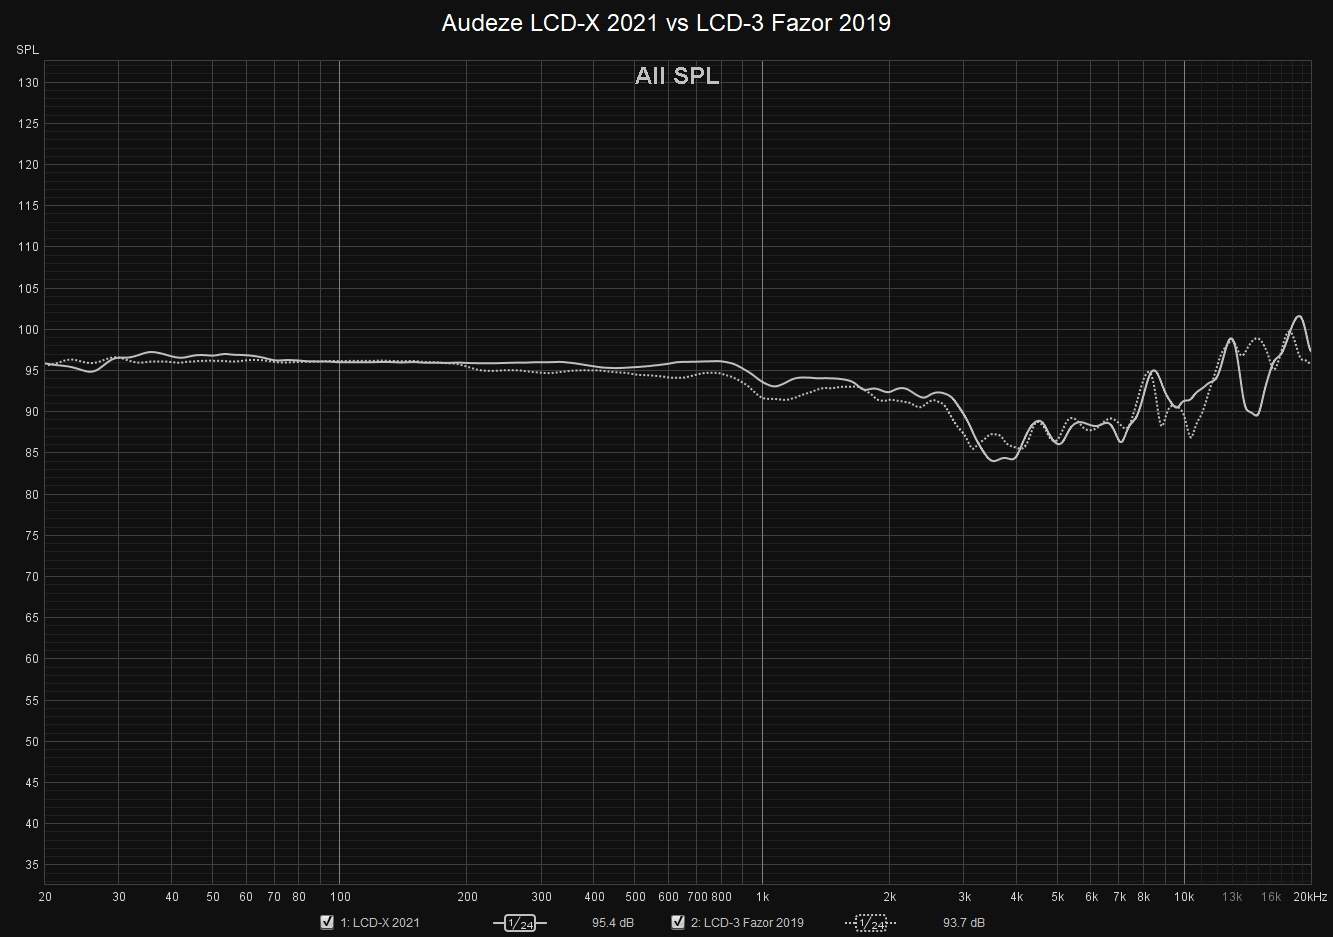 lcdx2021_vs_lcd3.jpg